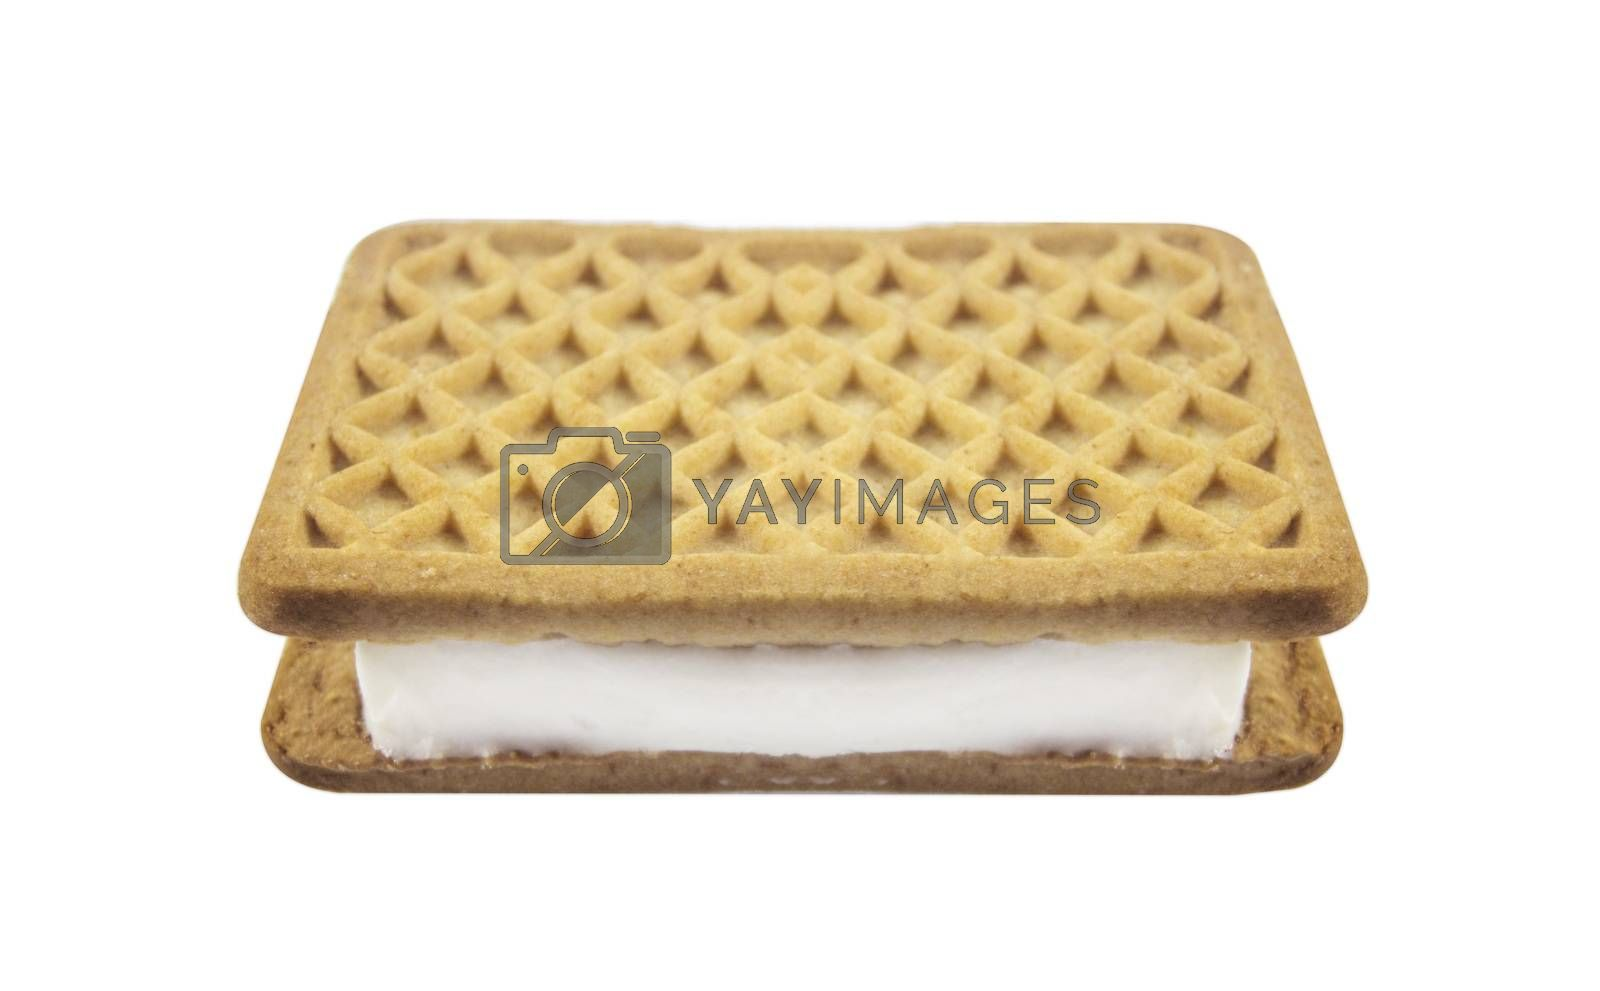 Vanilla and cookie ice cream sandwich bar on white background.